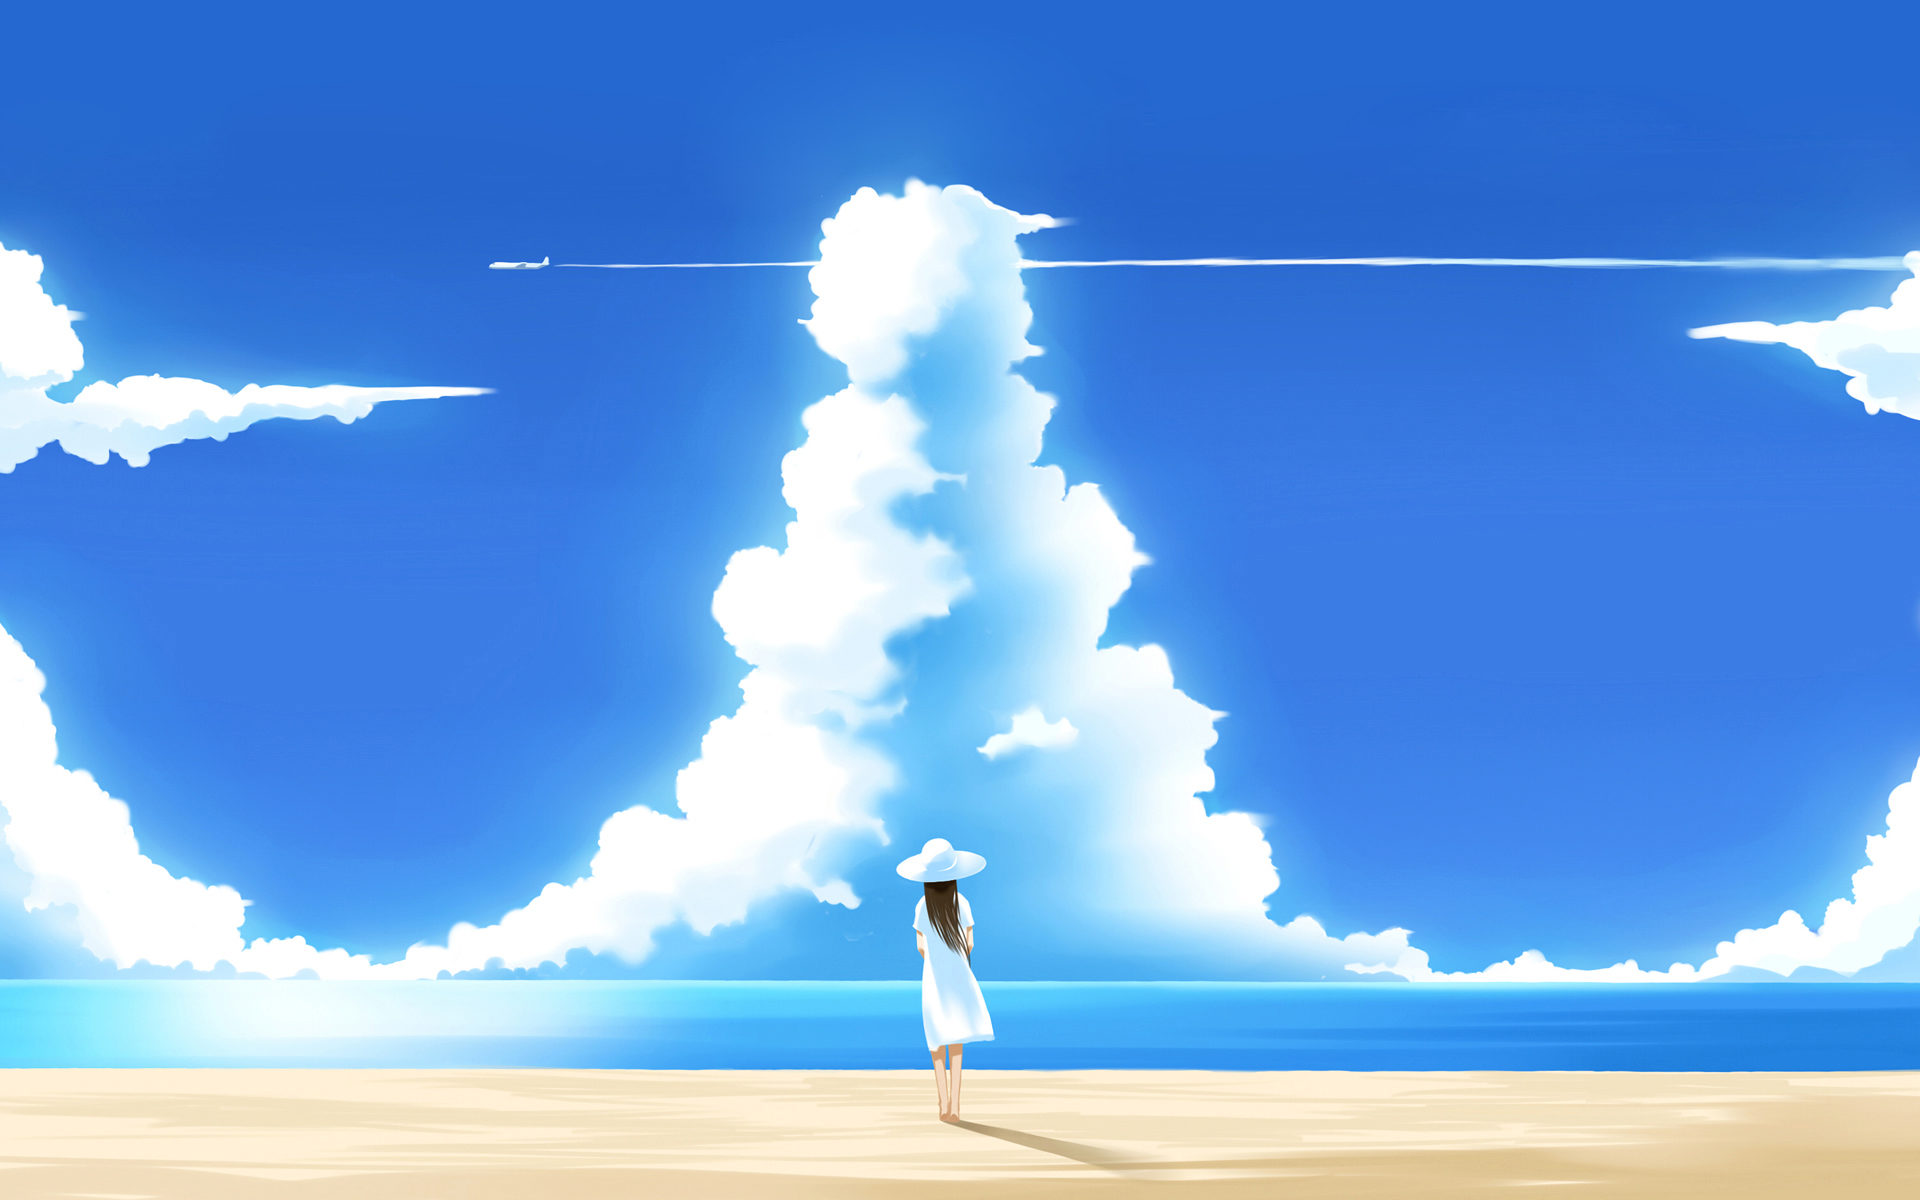 Sky anime wallpaper 22925091 fanpop - Anime sky background ...